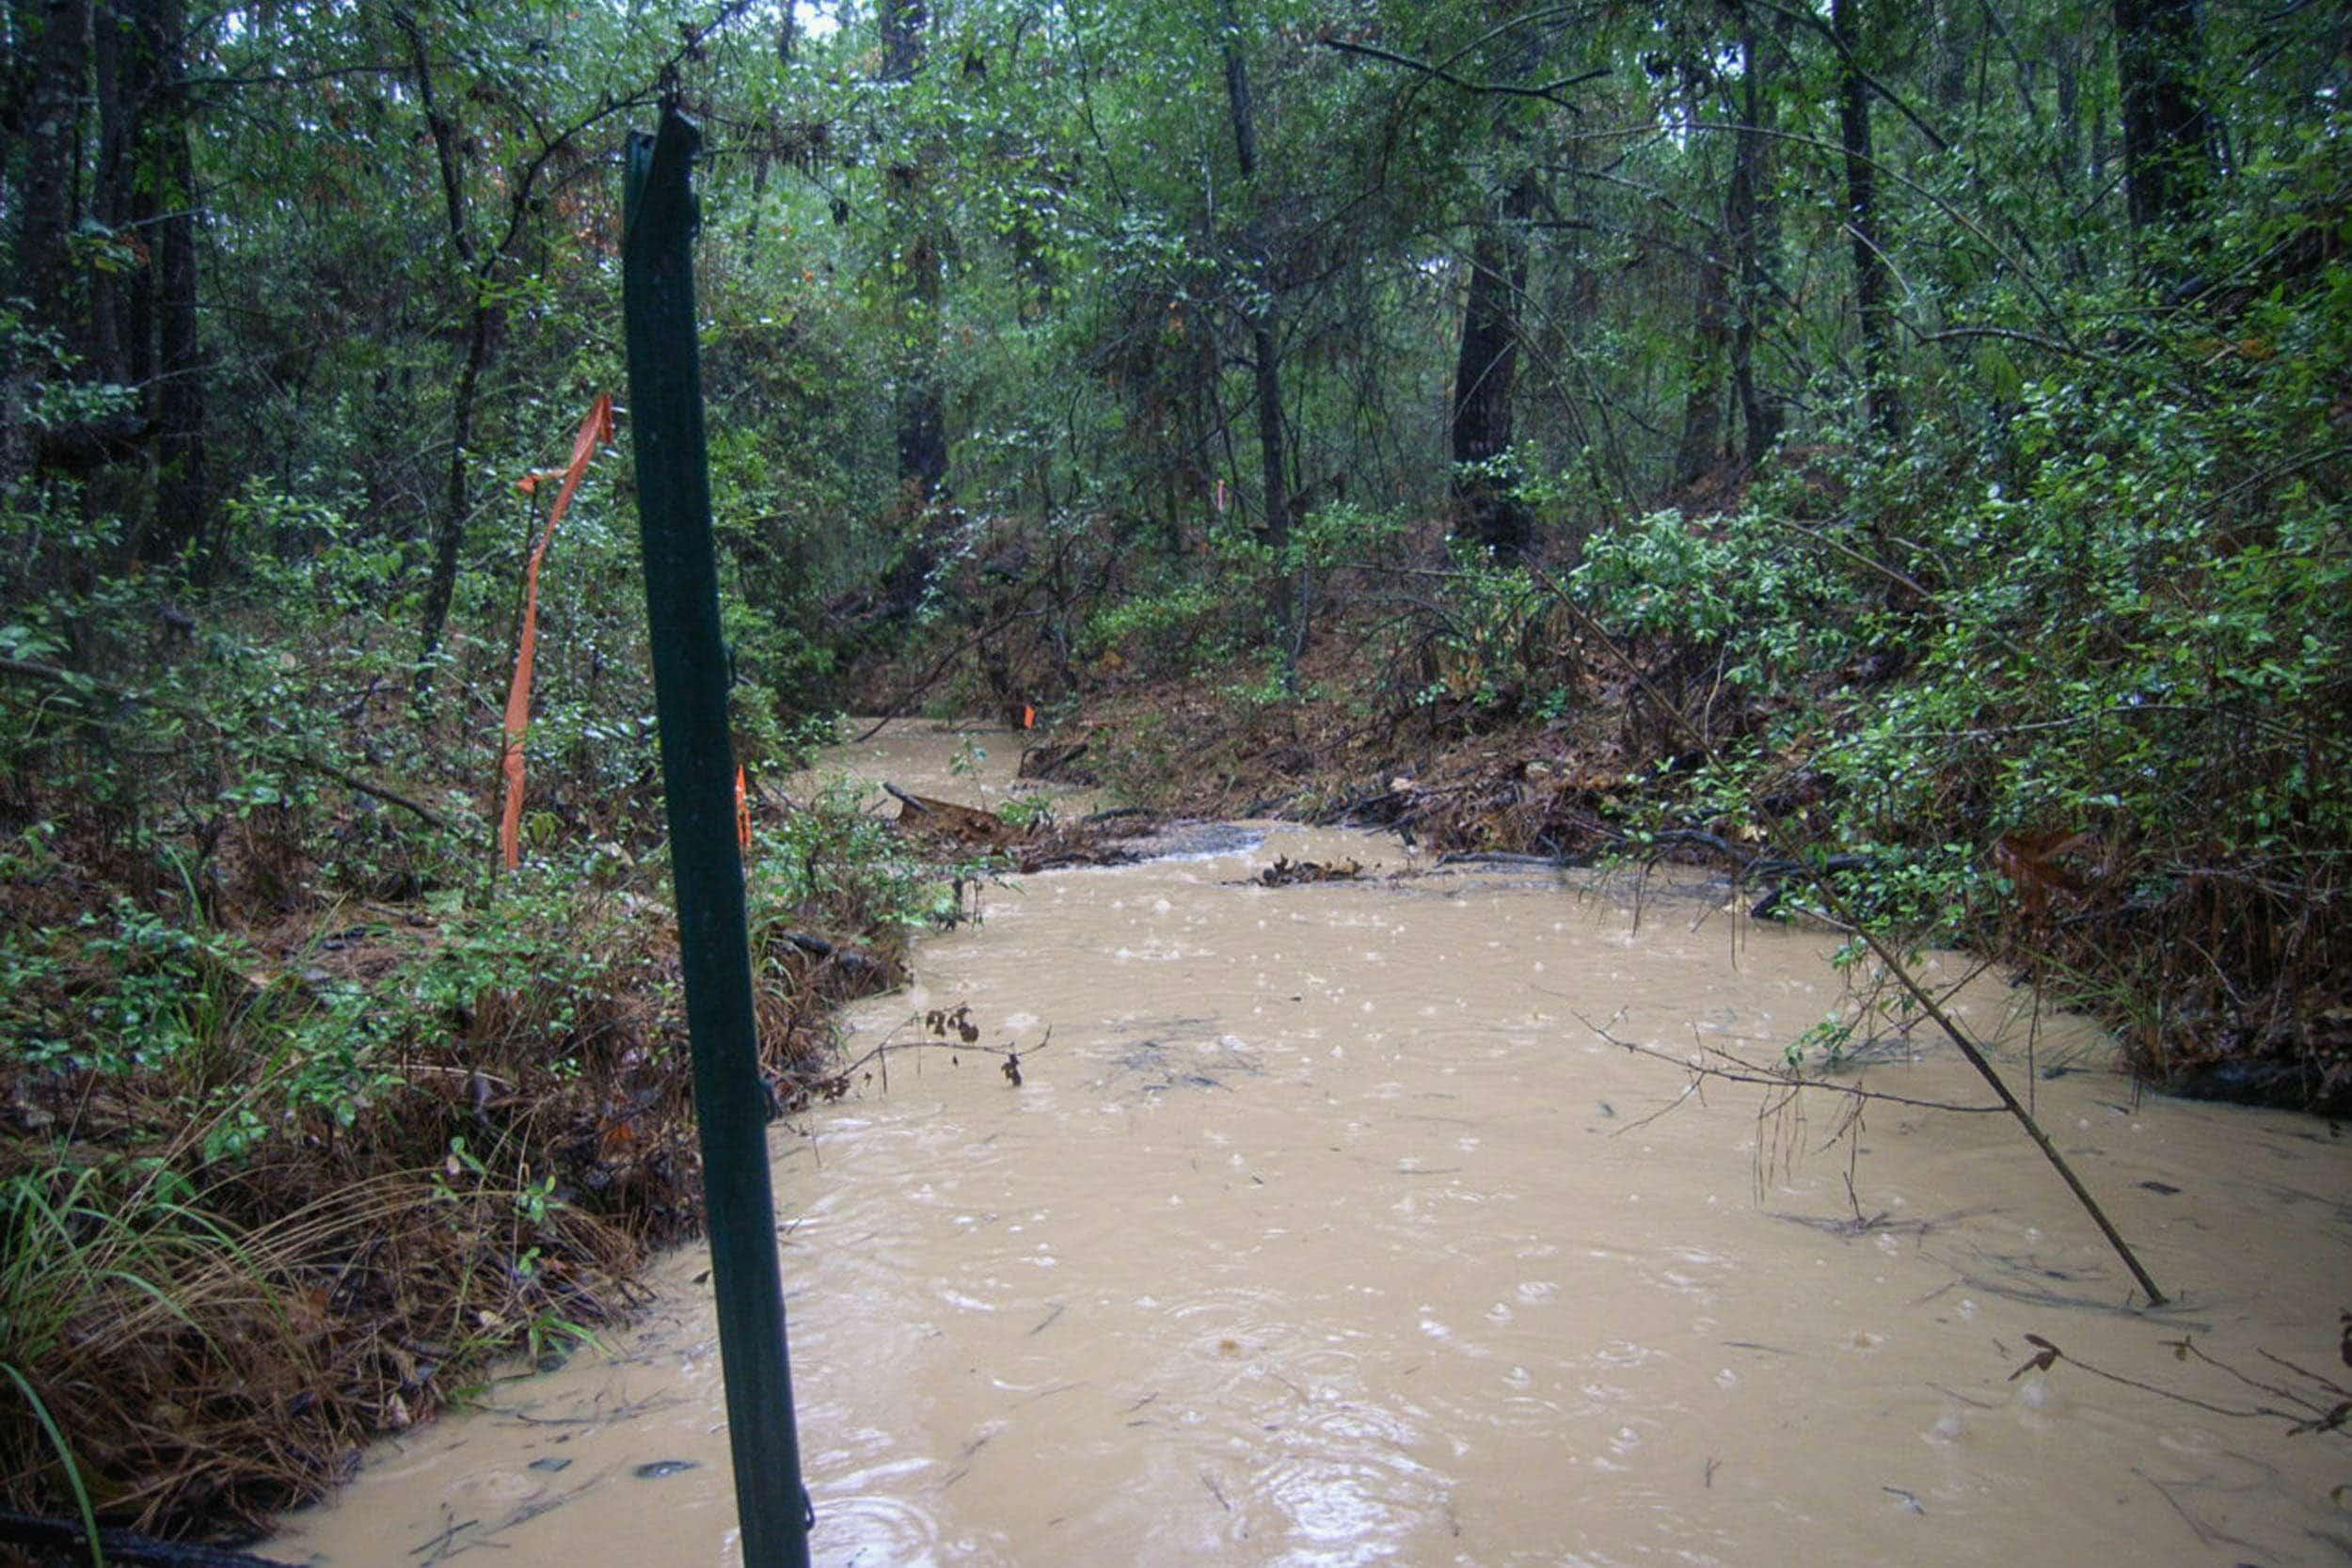 Site 1 during wet weather sampling event 3, June 22, 2011.